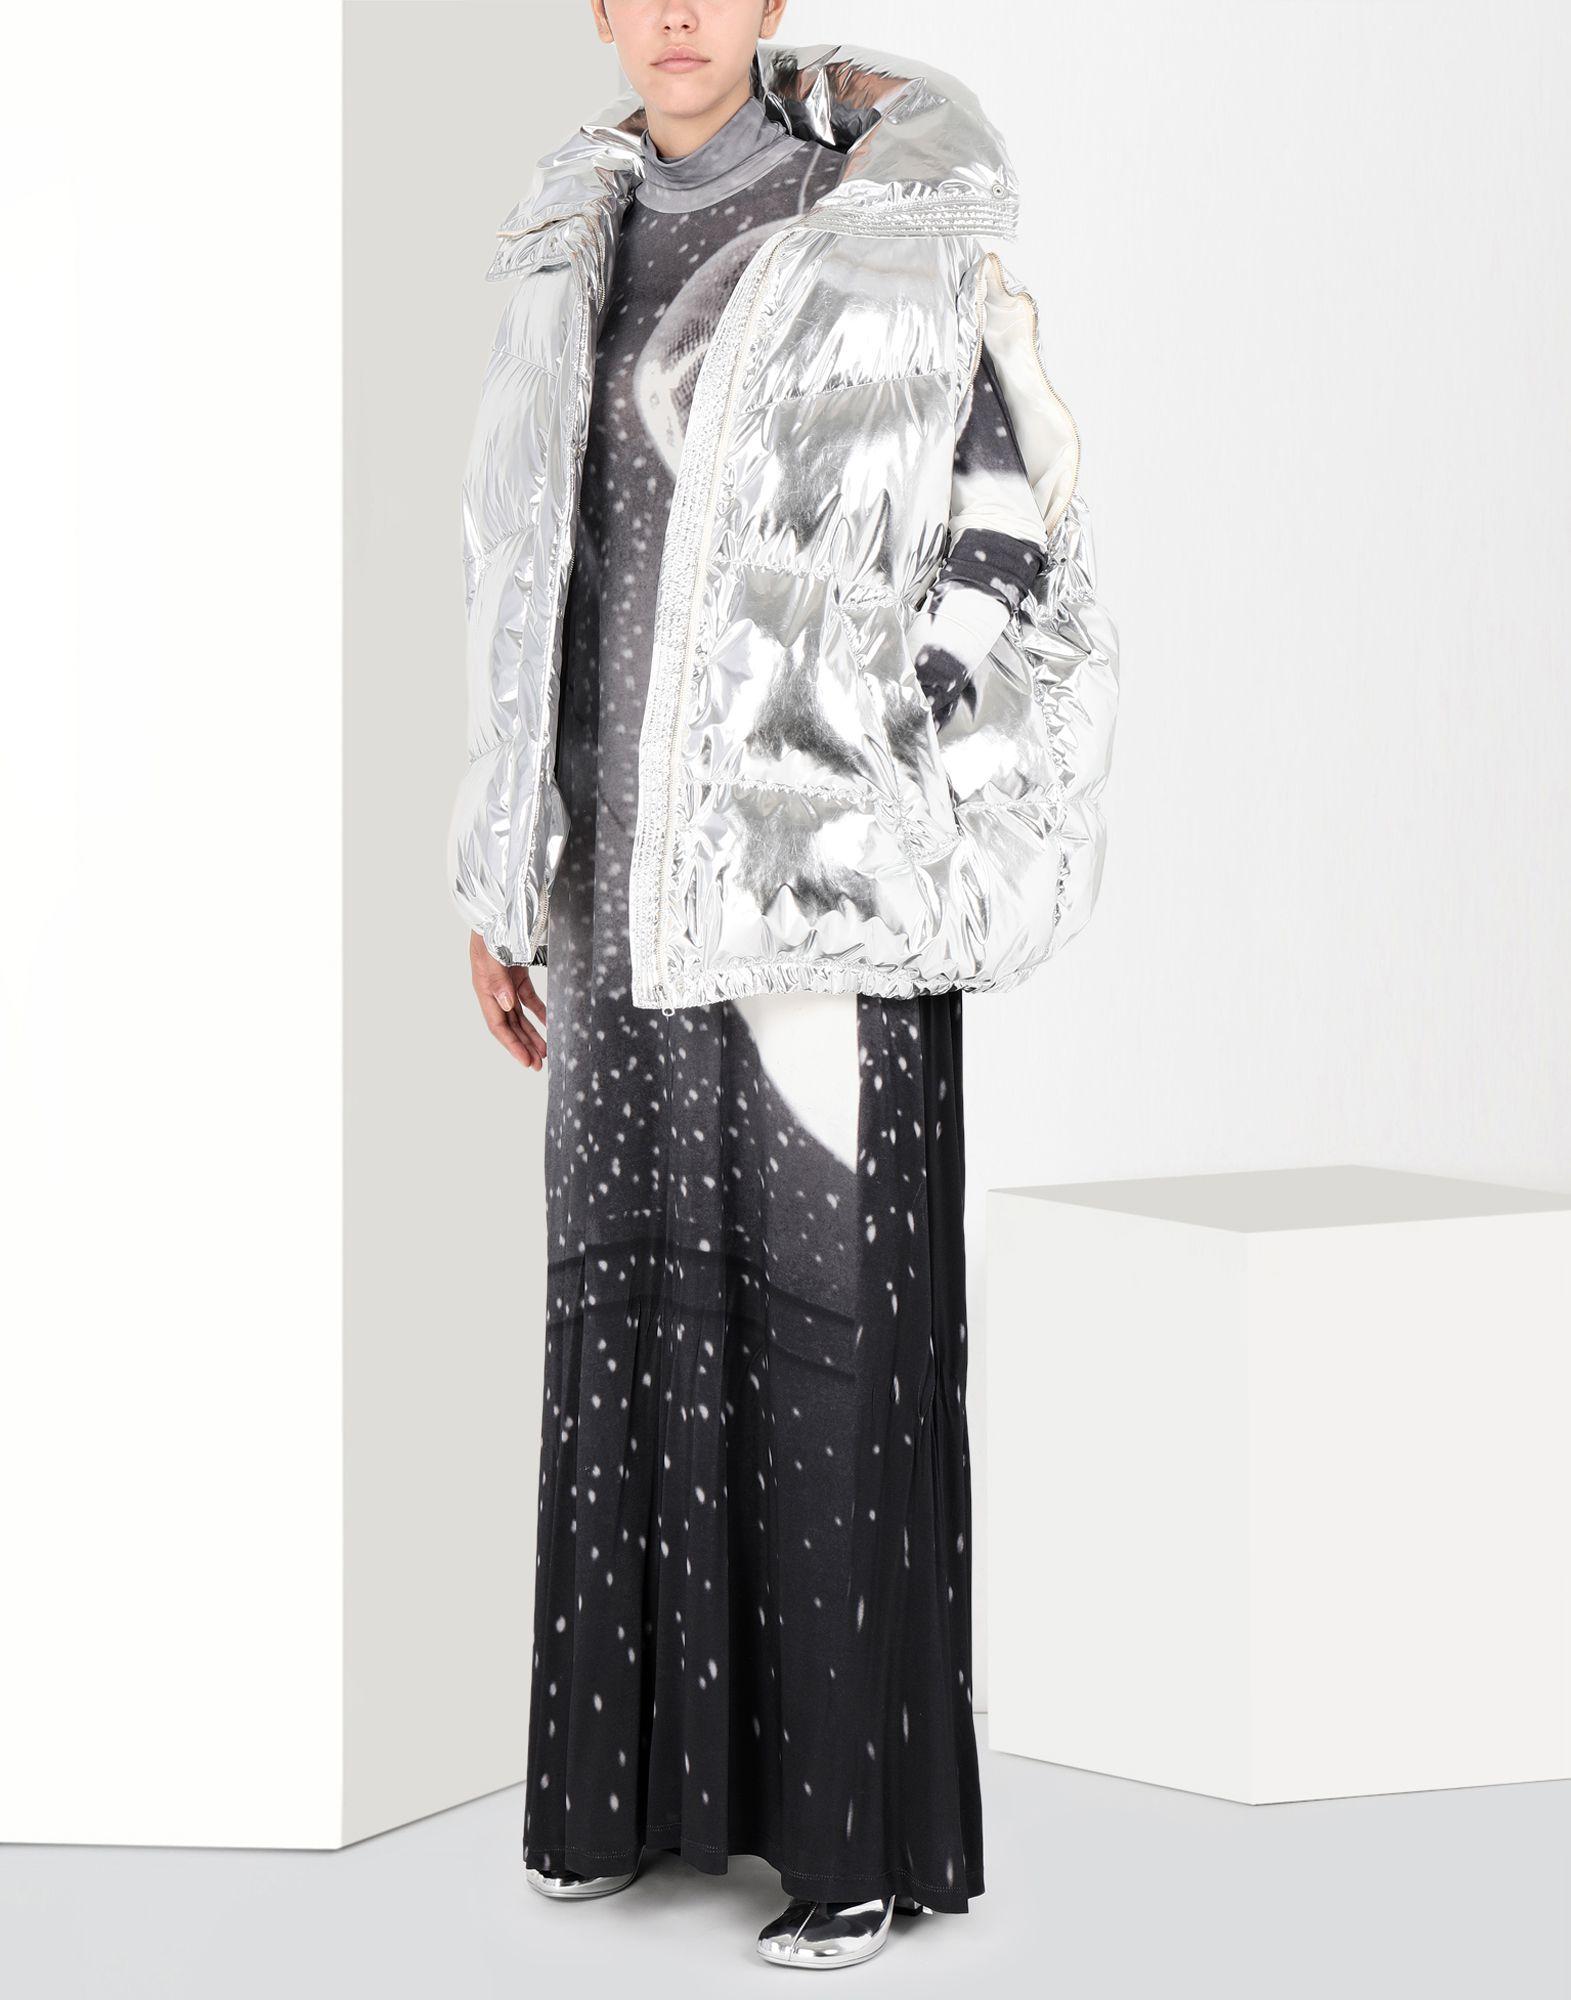 MM6 MAISON MARGIELA Reflex print long dress Long dress Woman r